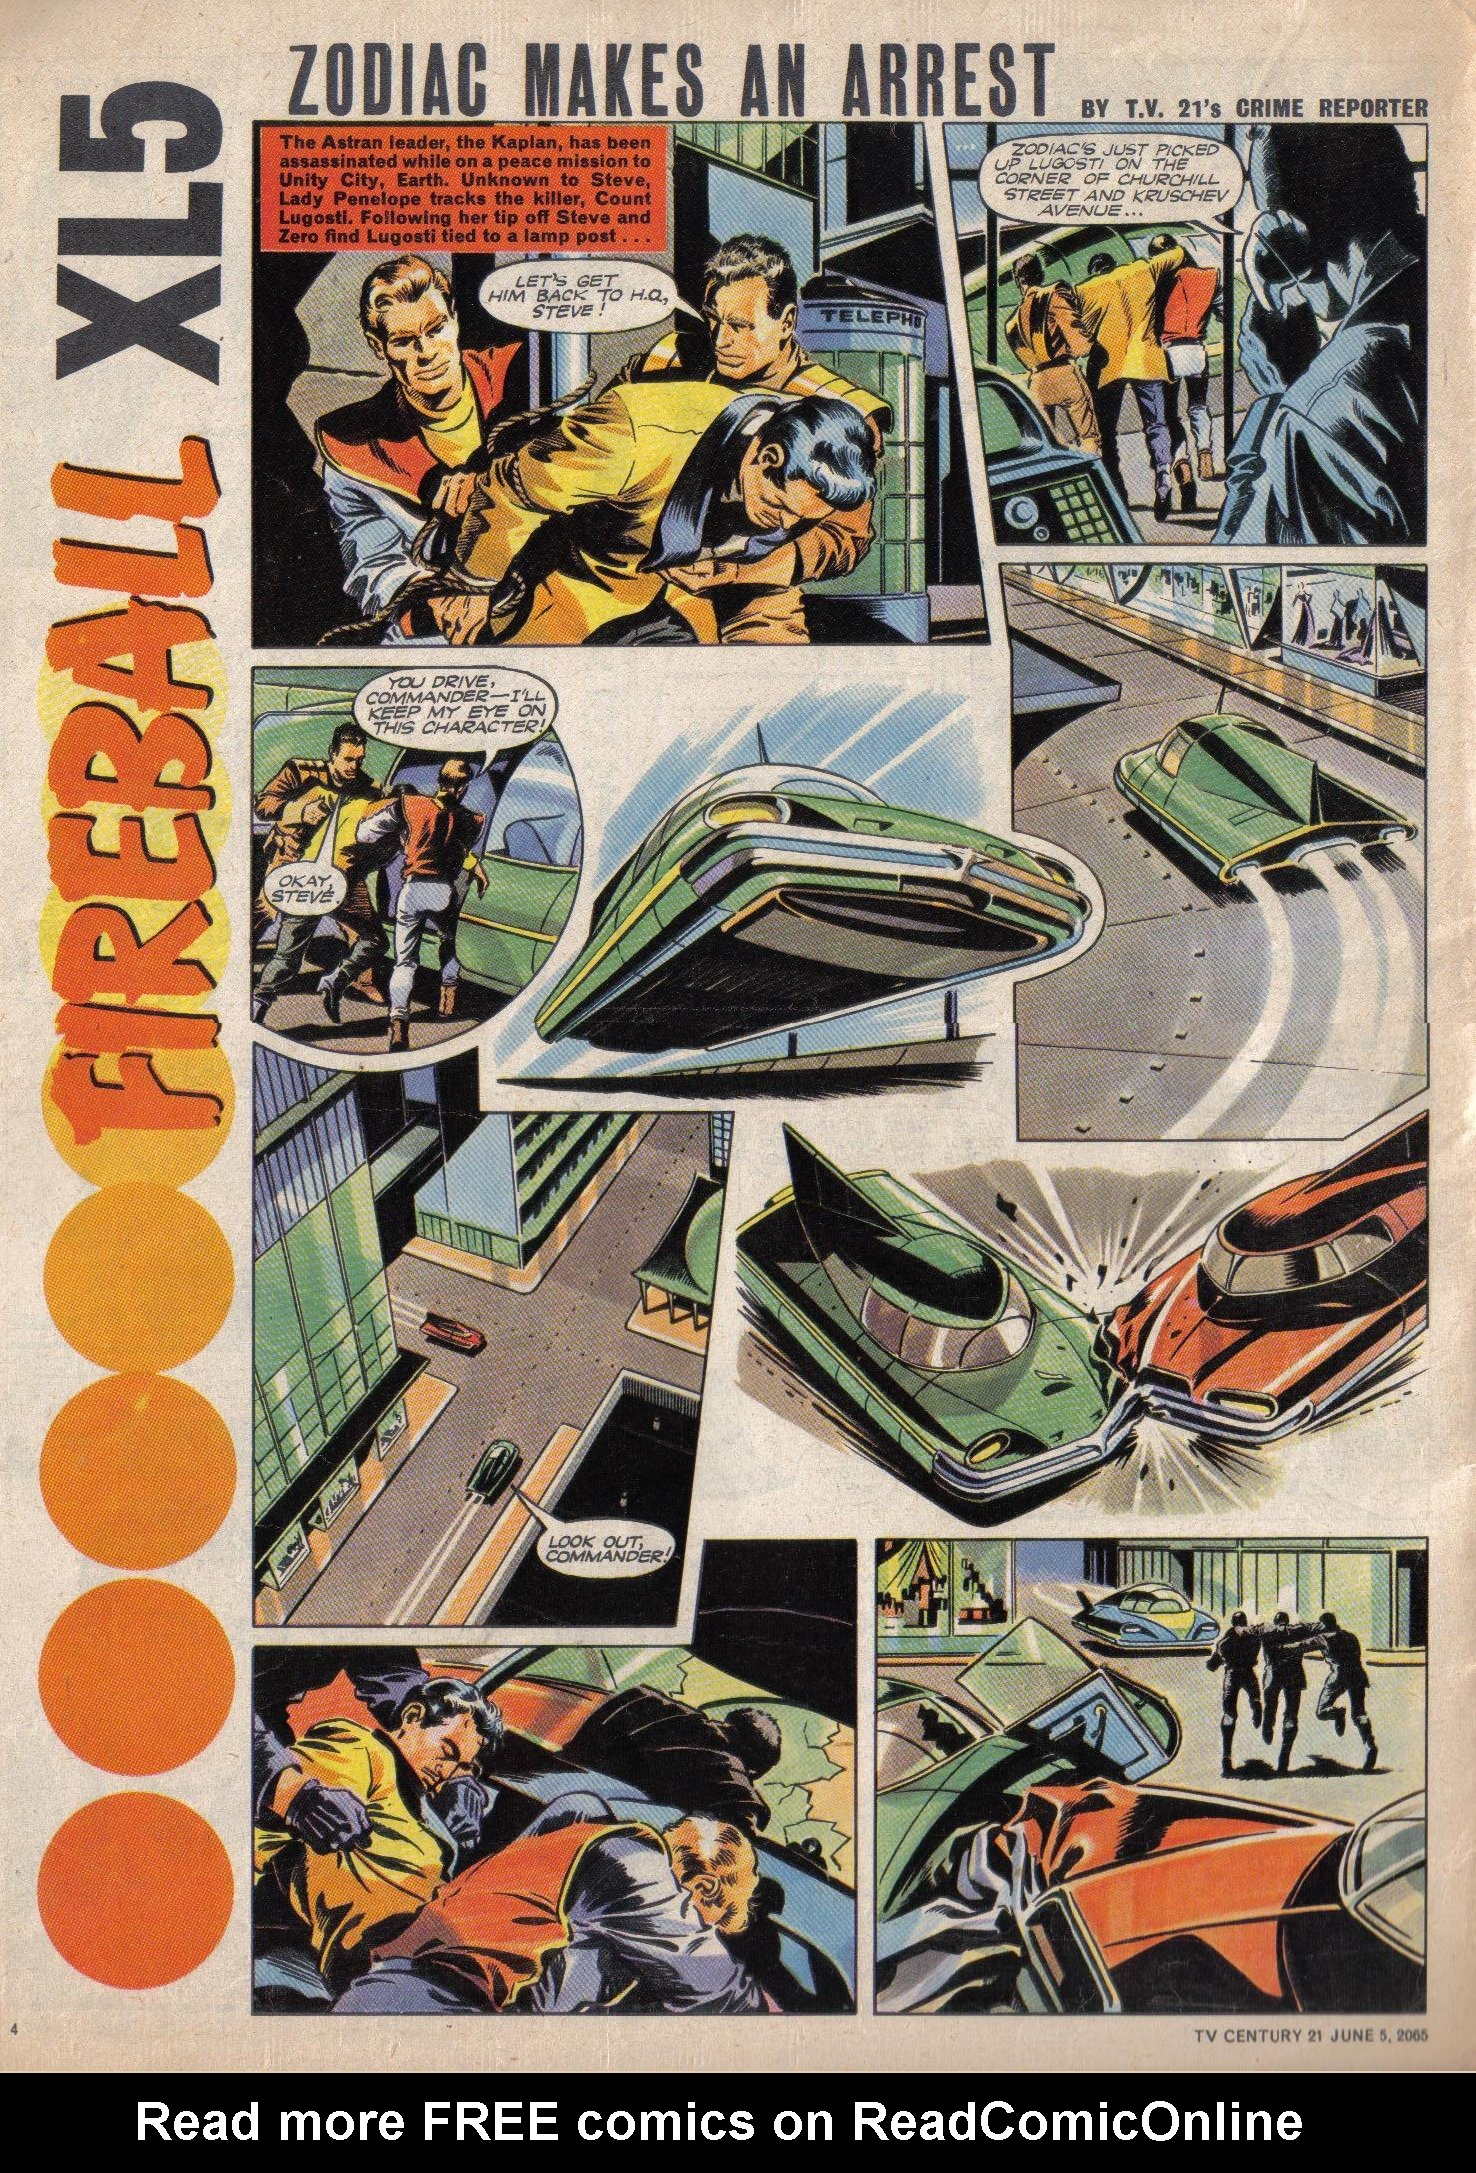 Read online TV Century 21 (TV 21) comic -  Issue #20 - 4